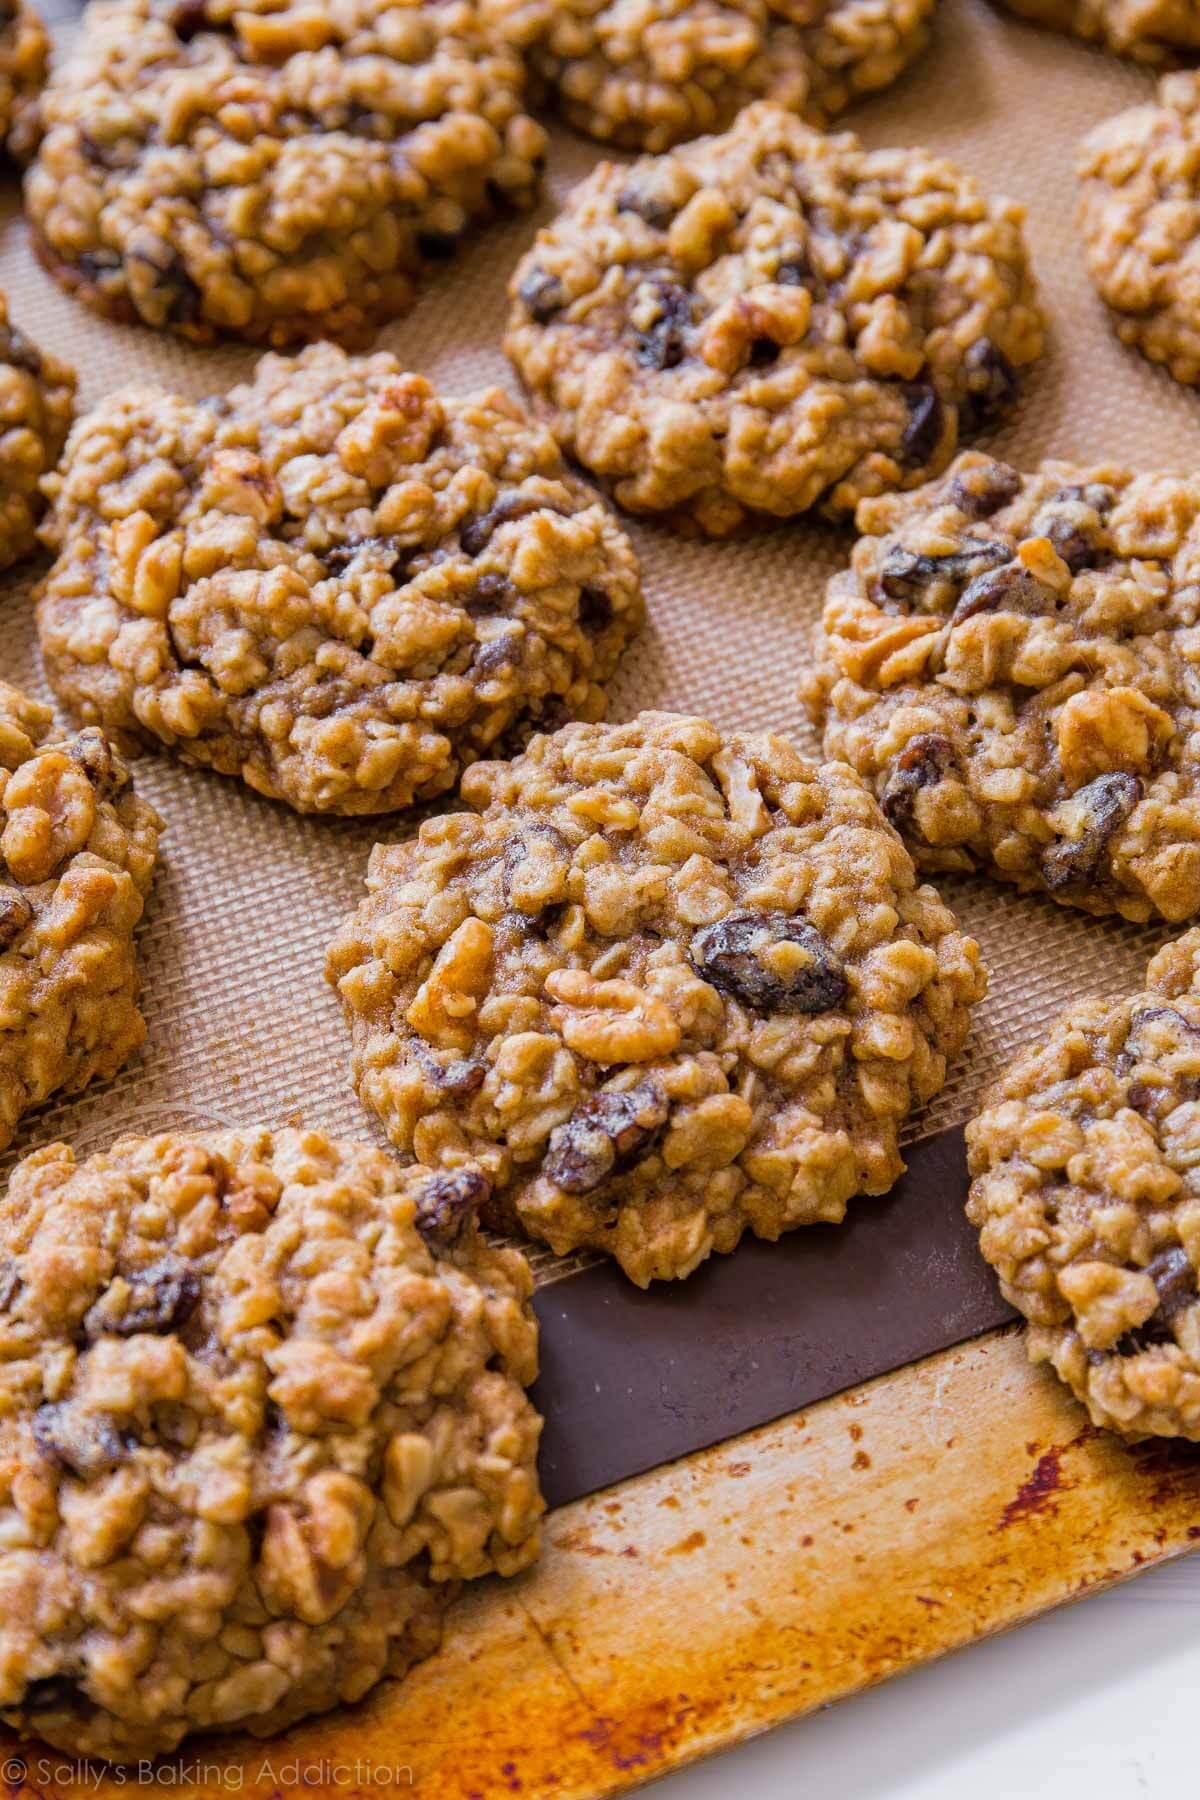 Soft Oatmeal Cookies  Soft & Chewy Oatmeal Raisin Cookies Sallys Baking Addiction